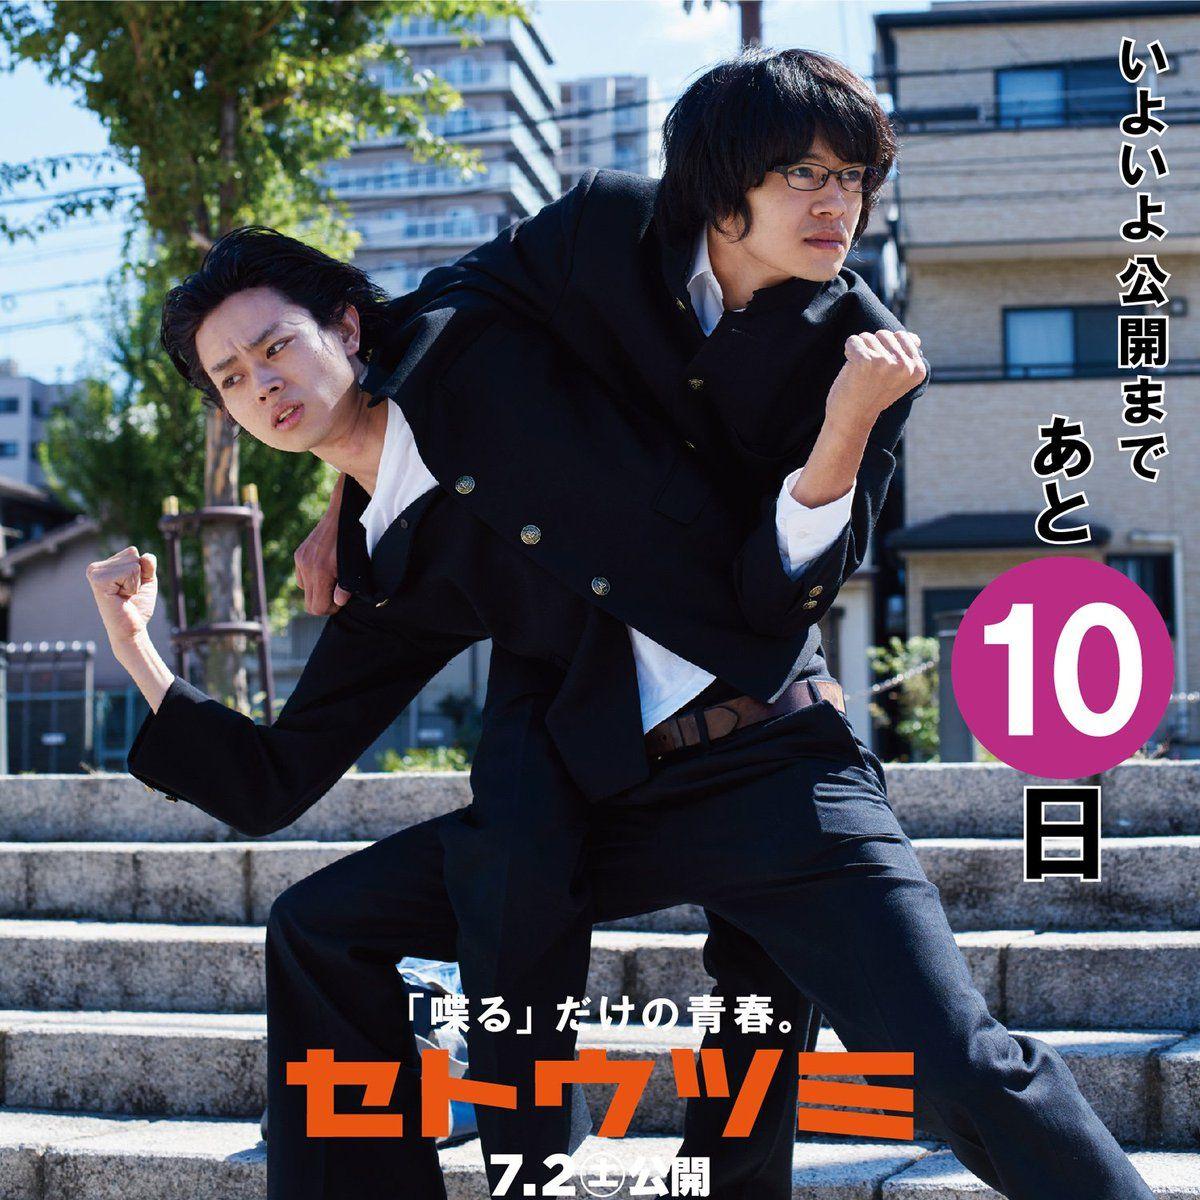 media tweets by 映画 セトウツミ setoutsumi eiga japanese movie poses in my feelings